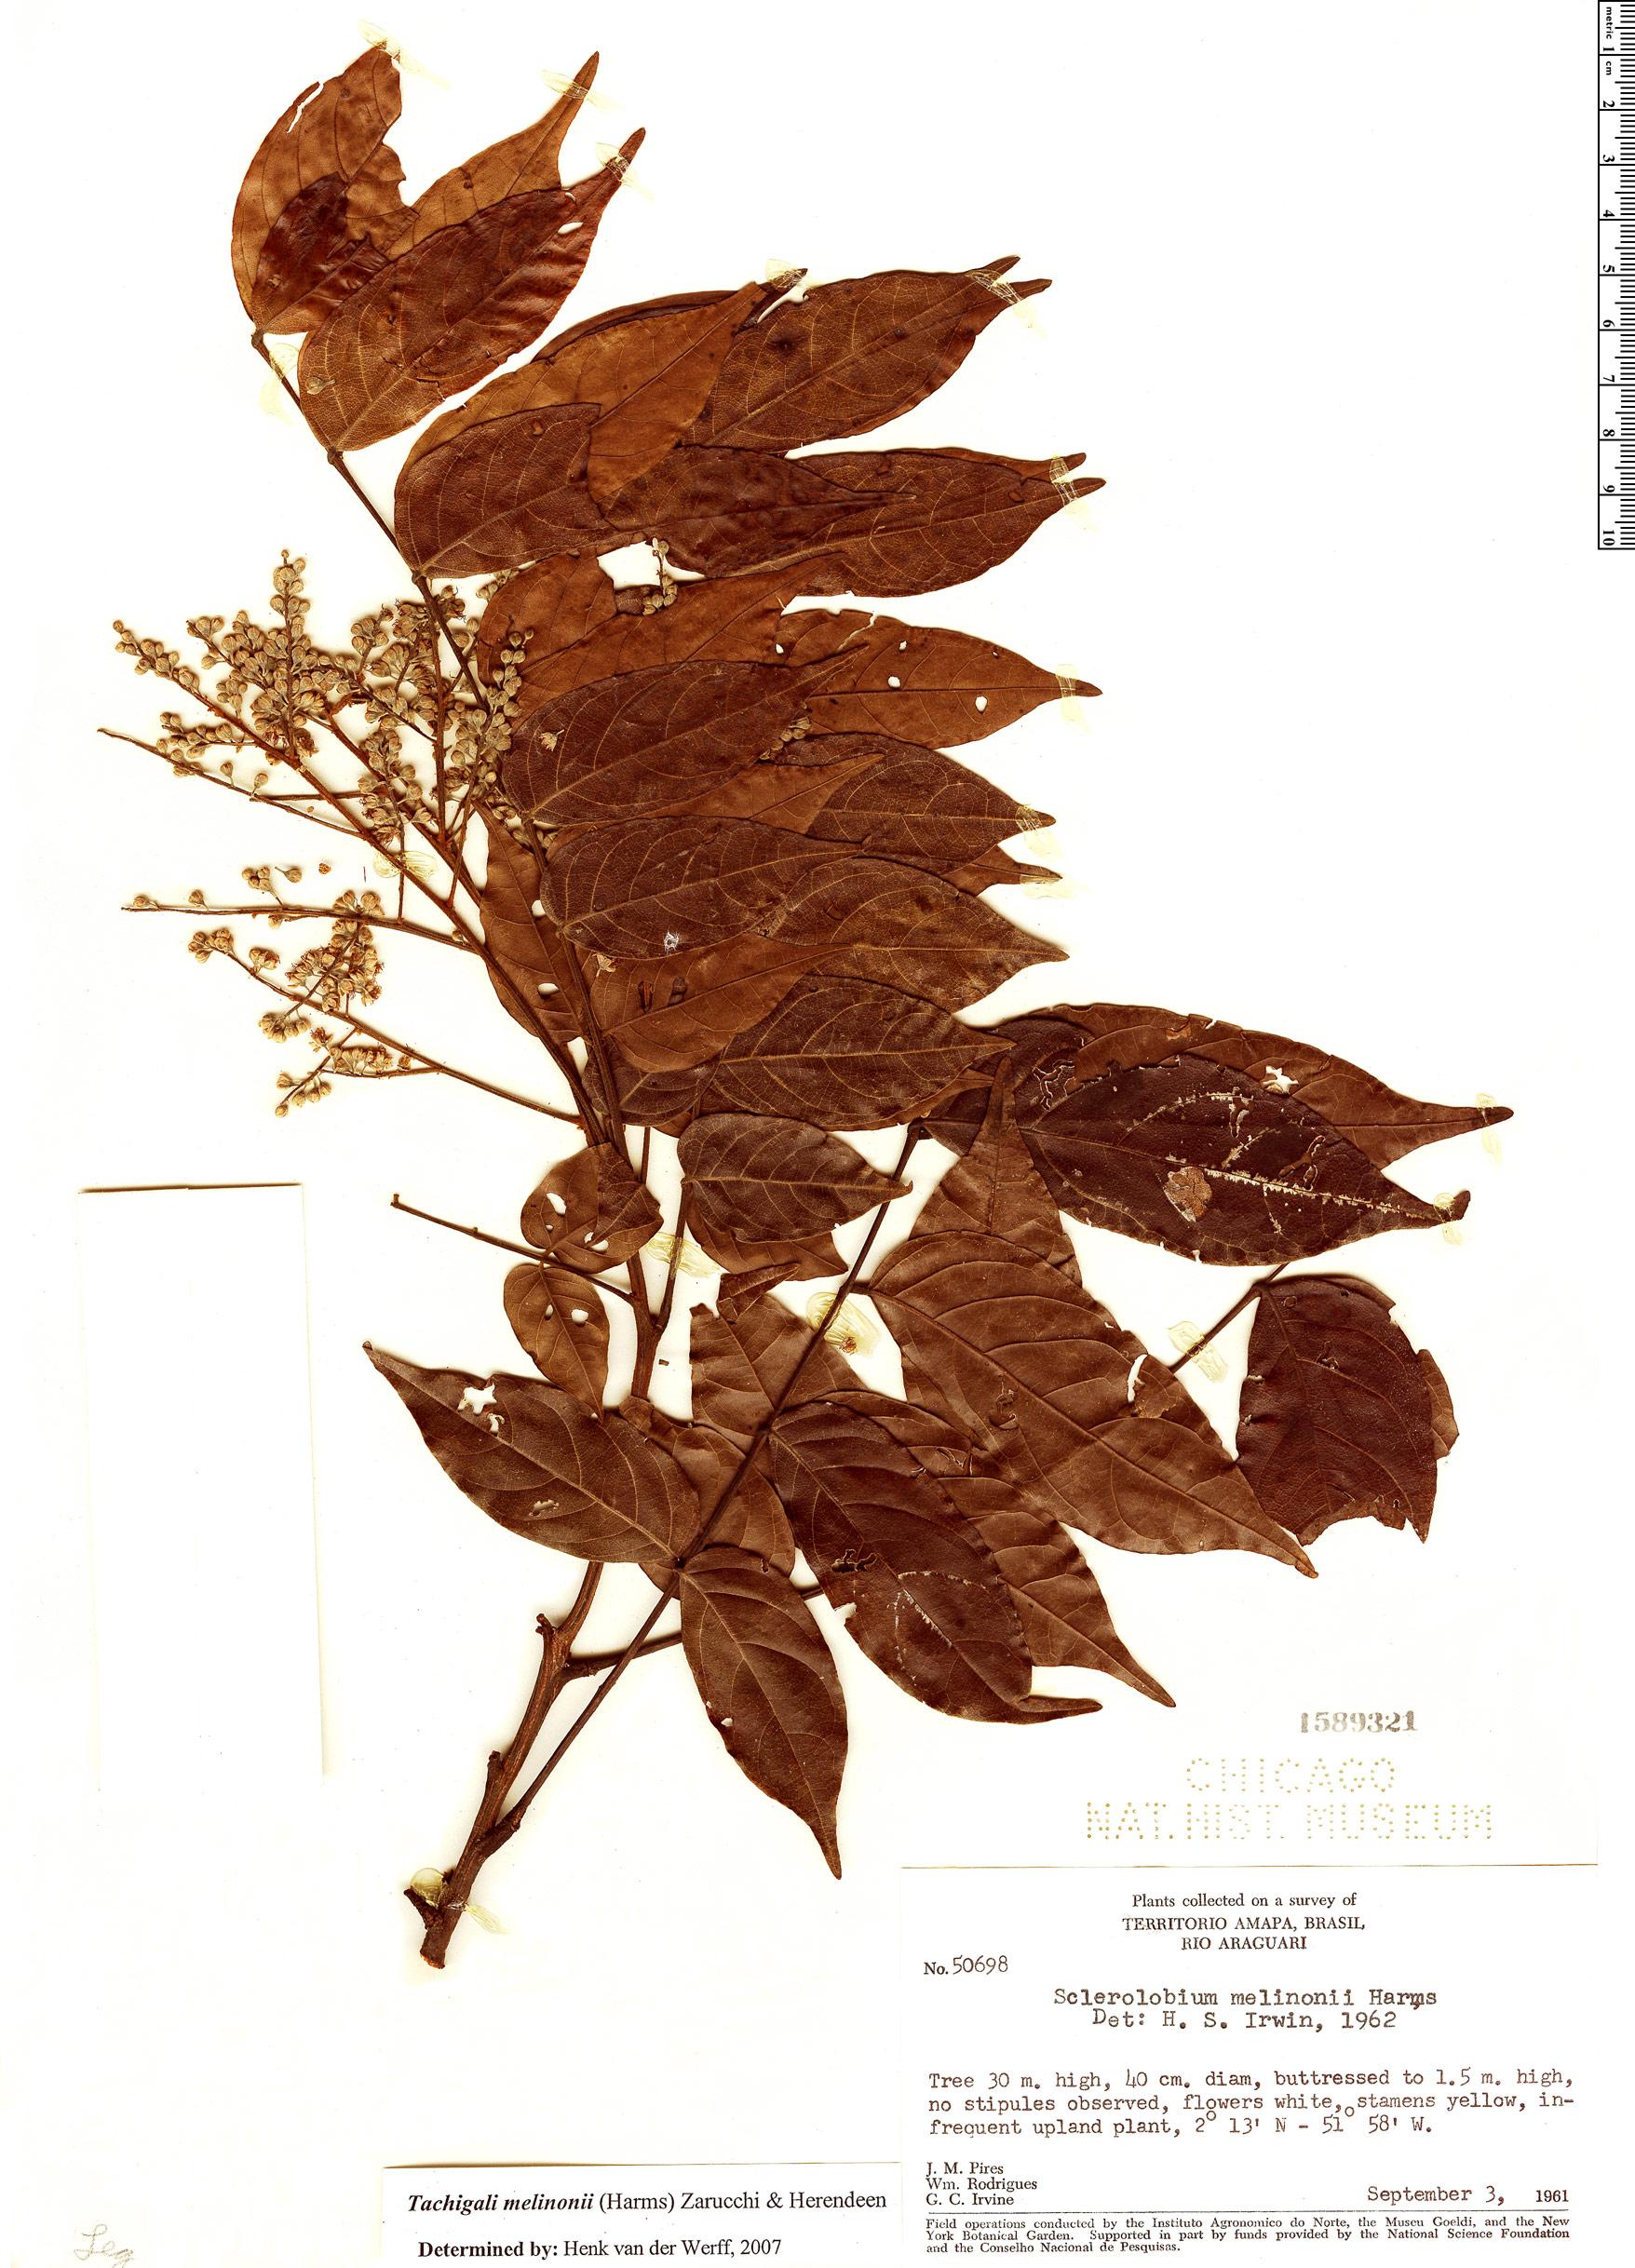 Specimen: Tachigali melinonii